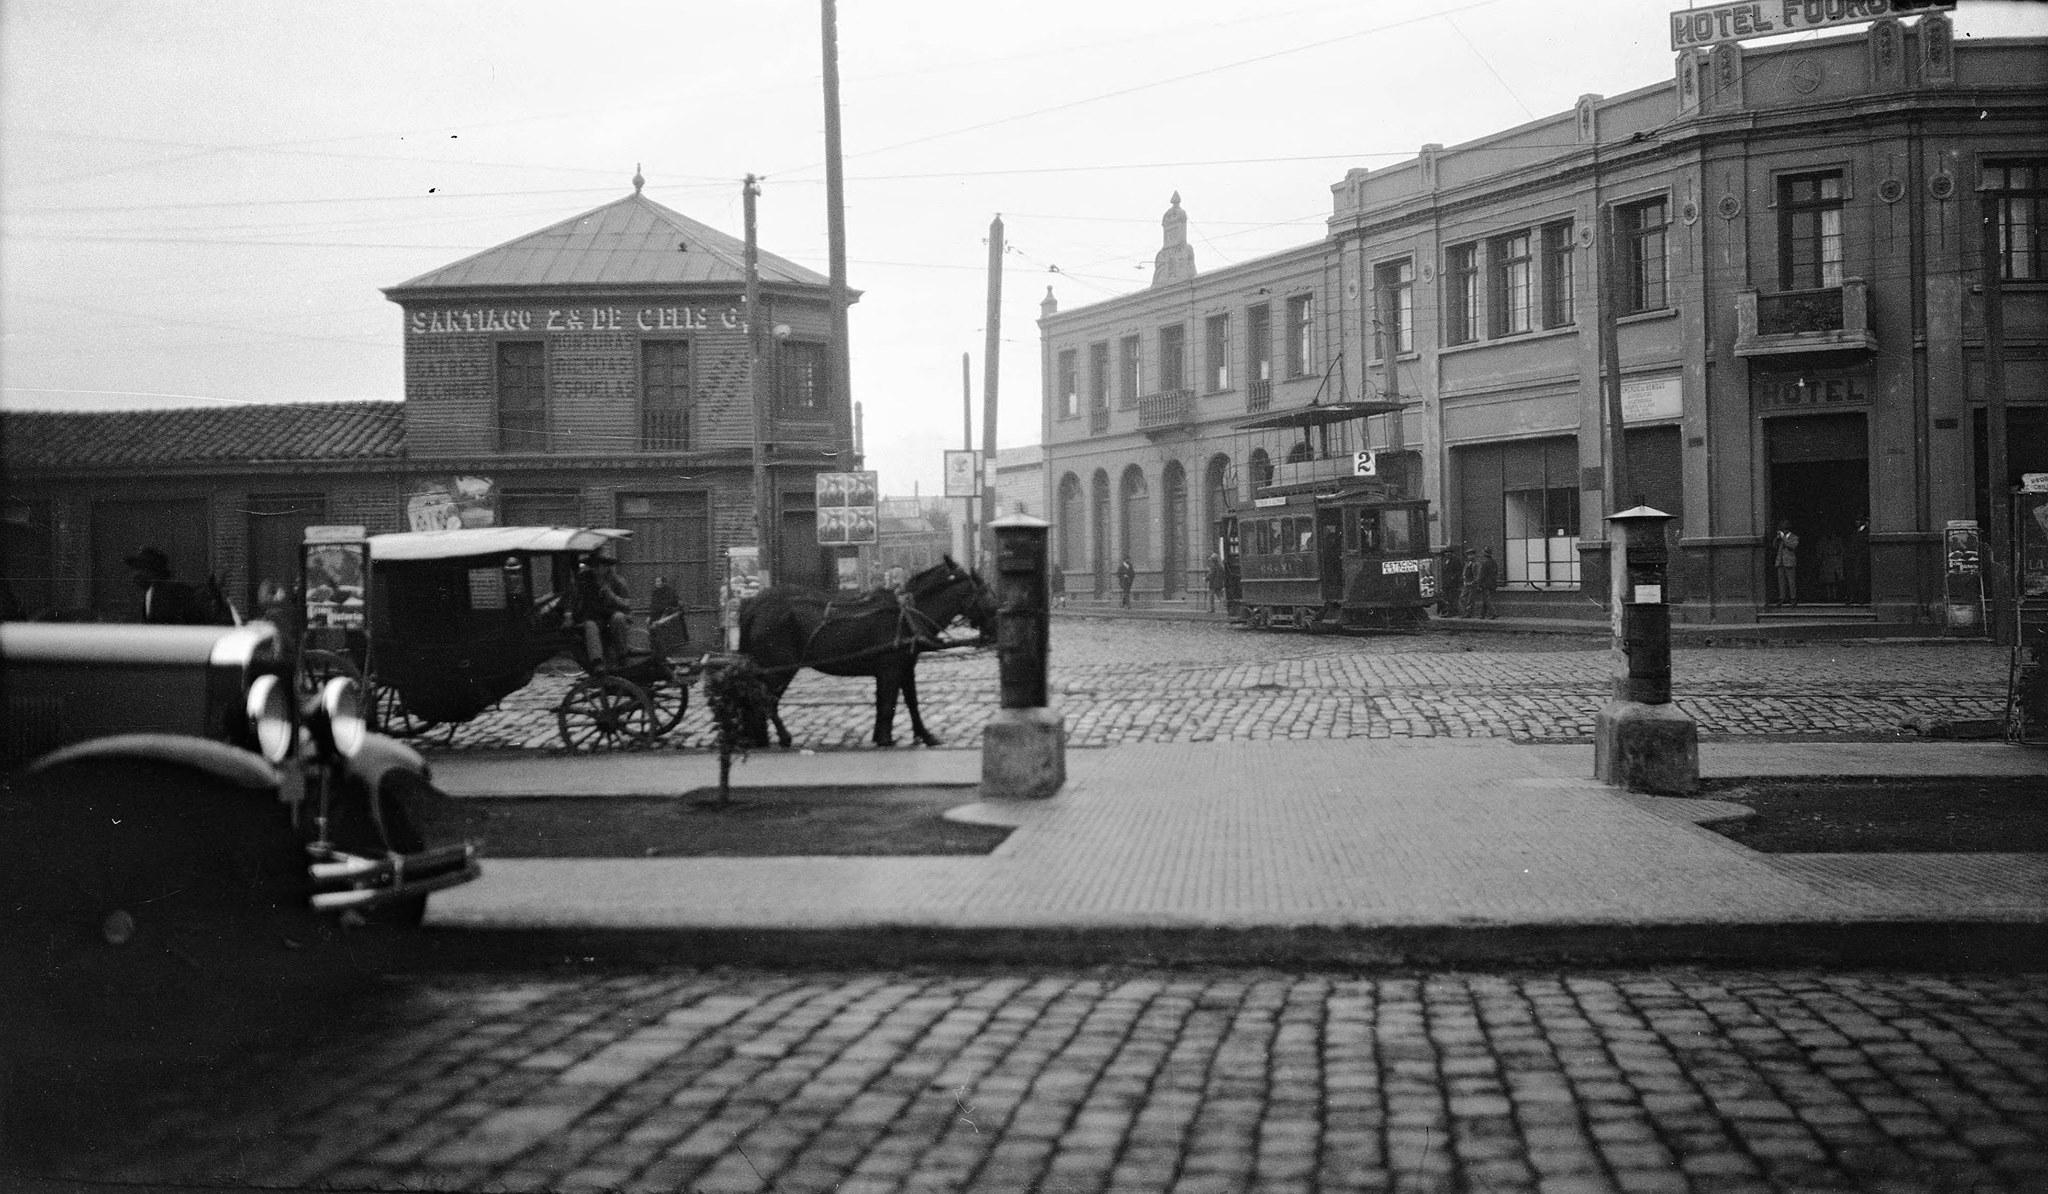 Enterreno - Fotos históricas de chile - fotos antiguas de Chile - Calle Barros Arana esquina de Miraflores en Temuco, 1930